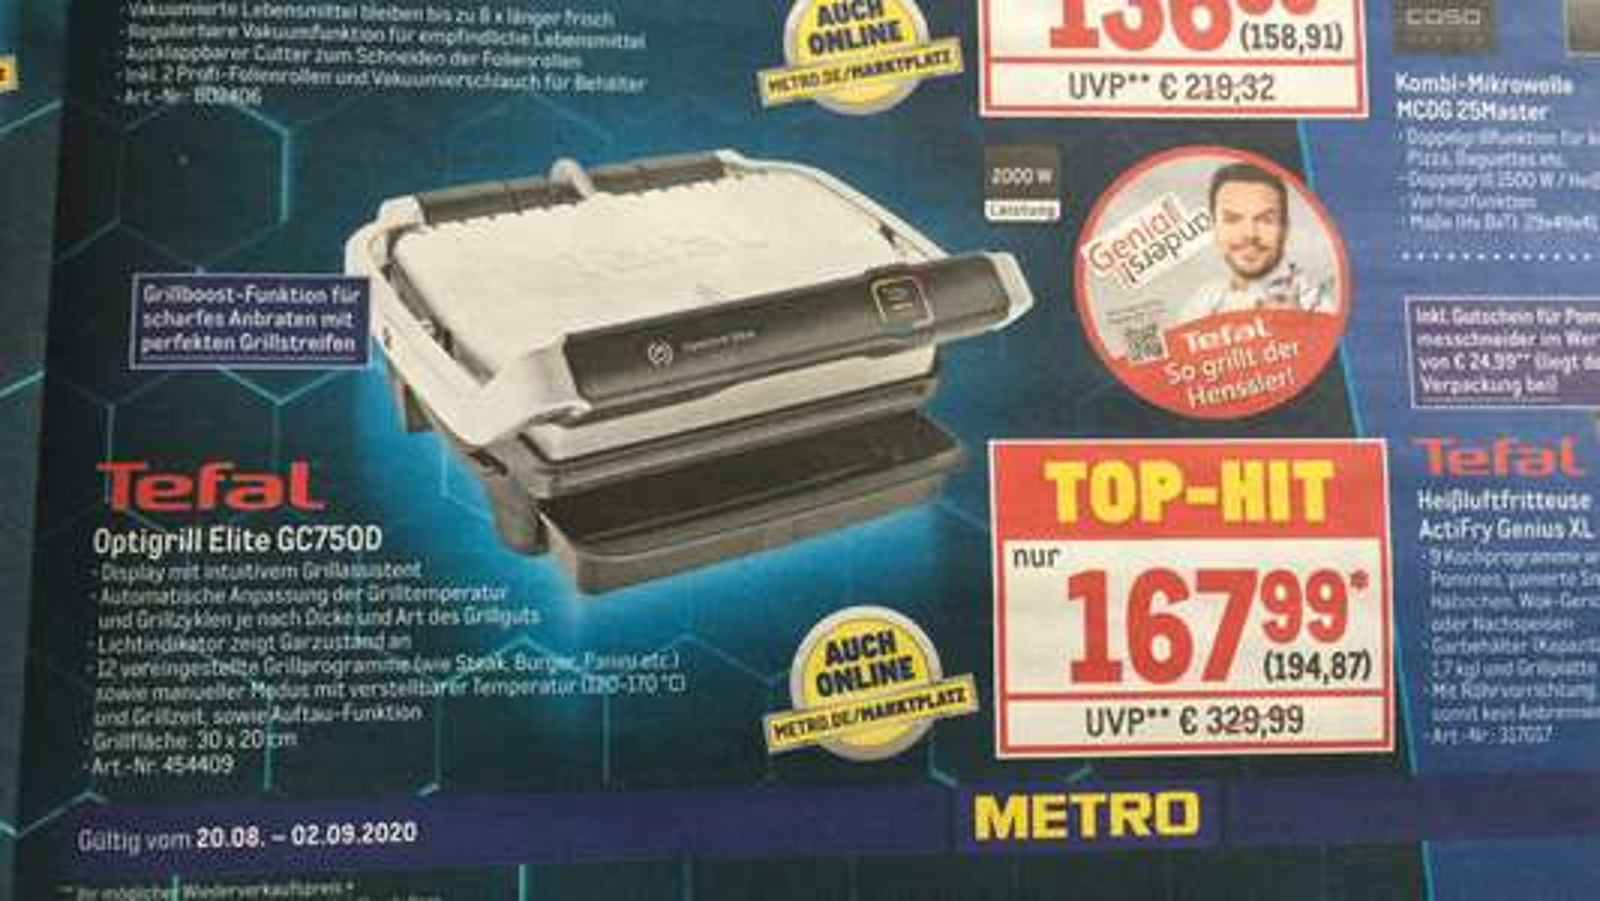 Tefal Optigrill Elite (GC 750D) // ohne Metrocard buchbar!